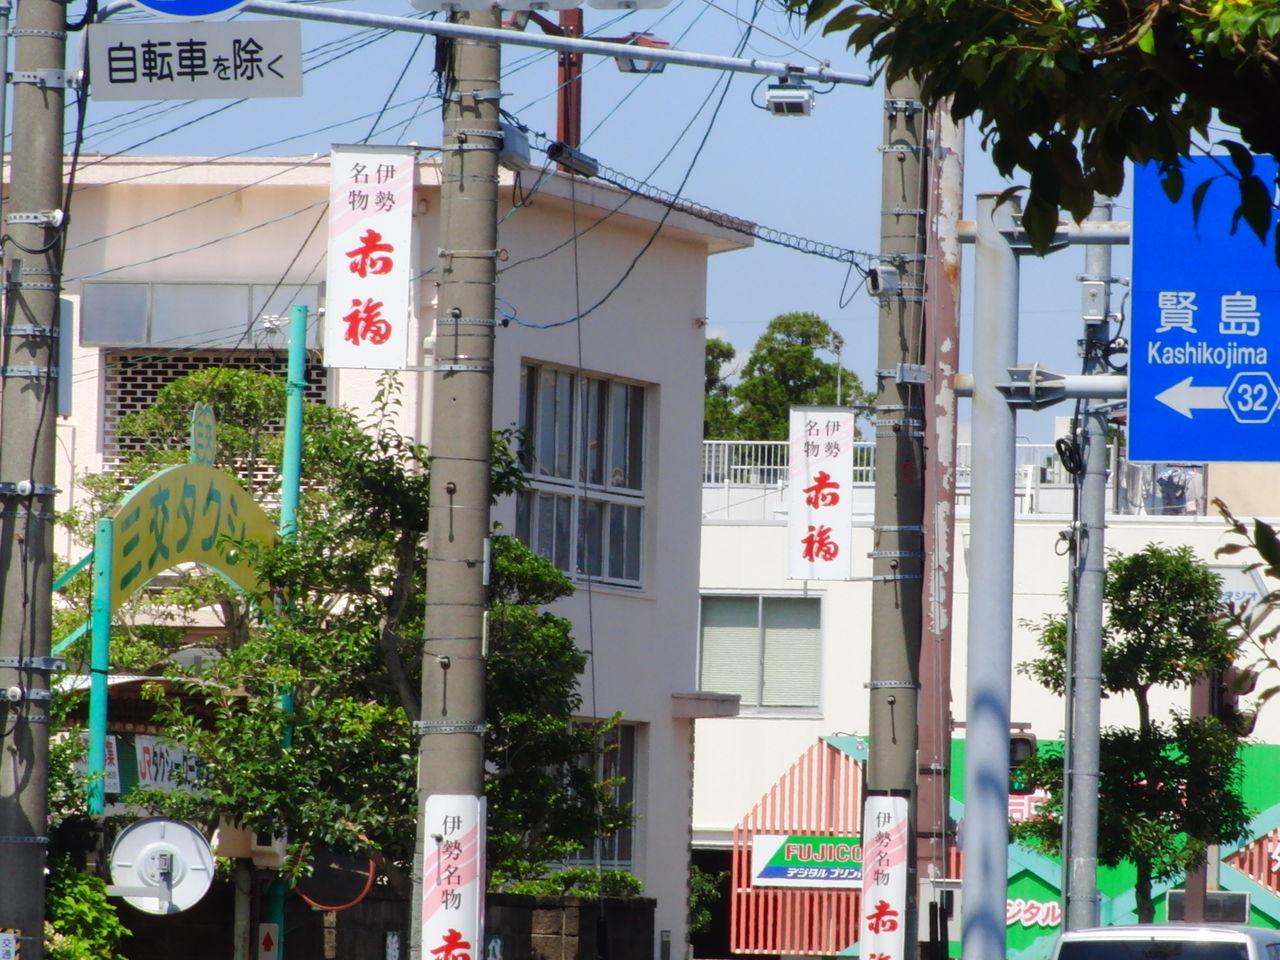 http://livedoor.blogimg.jp/ponu_55/imgs/f/6/f6a48887.jpg